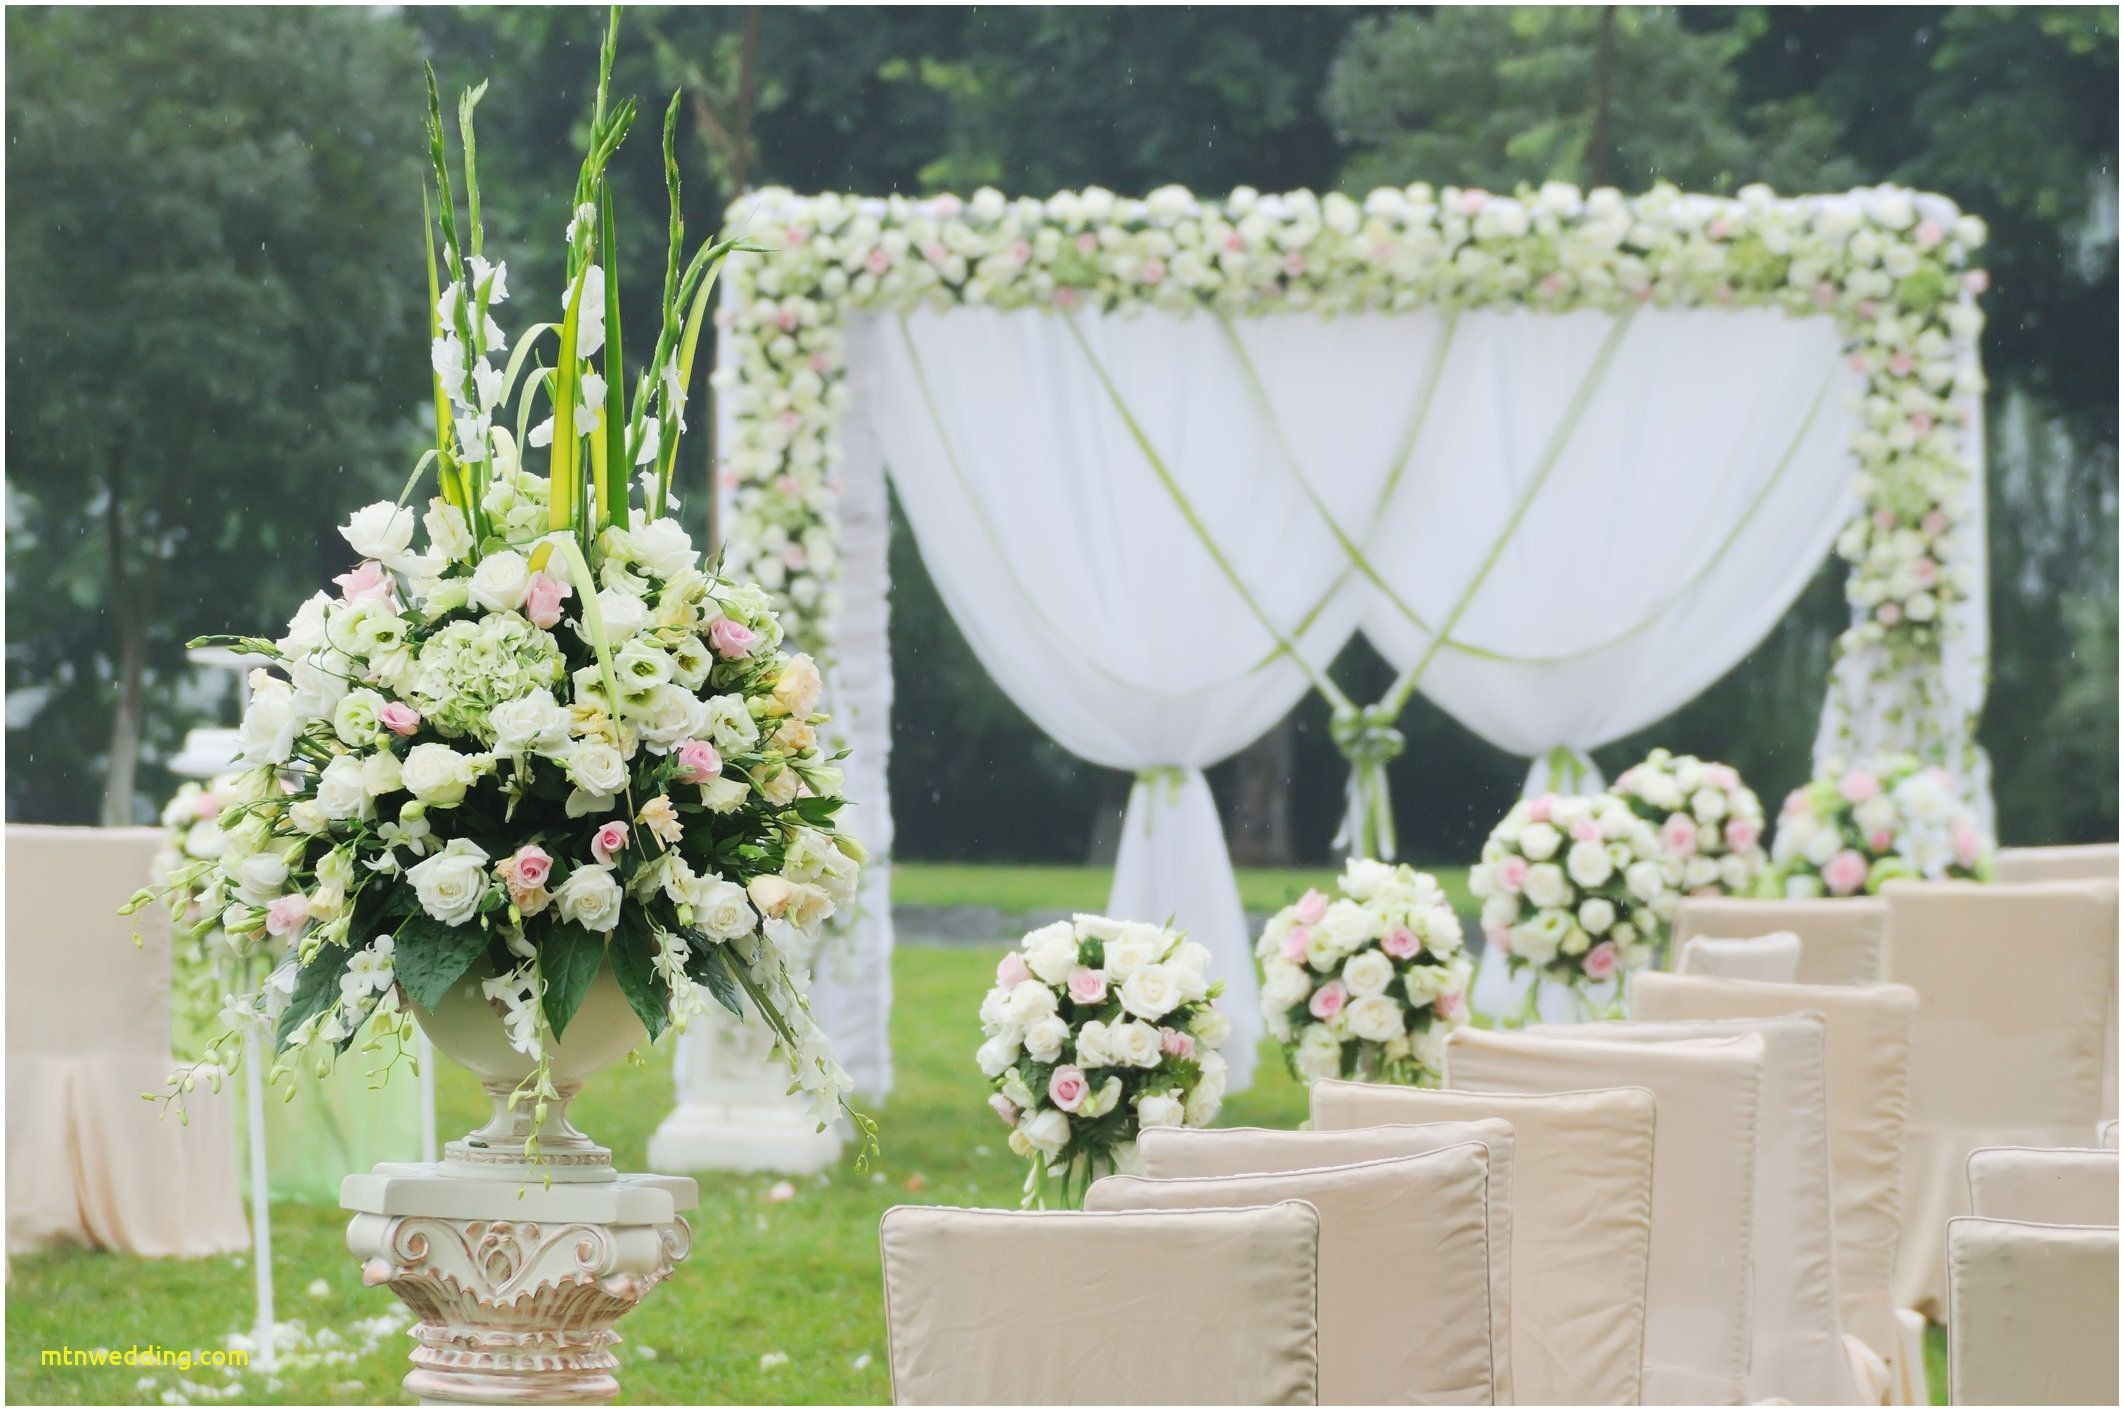 Comfort beach wedding arch decoration ideas